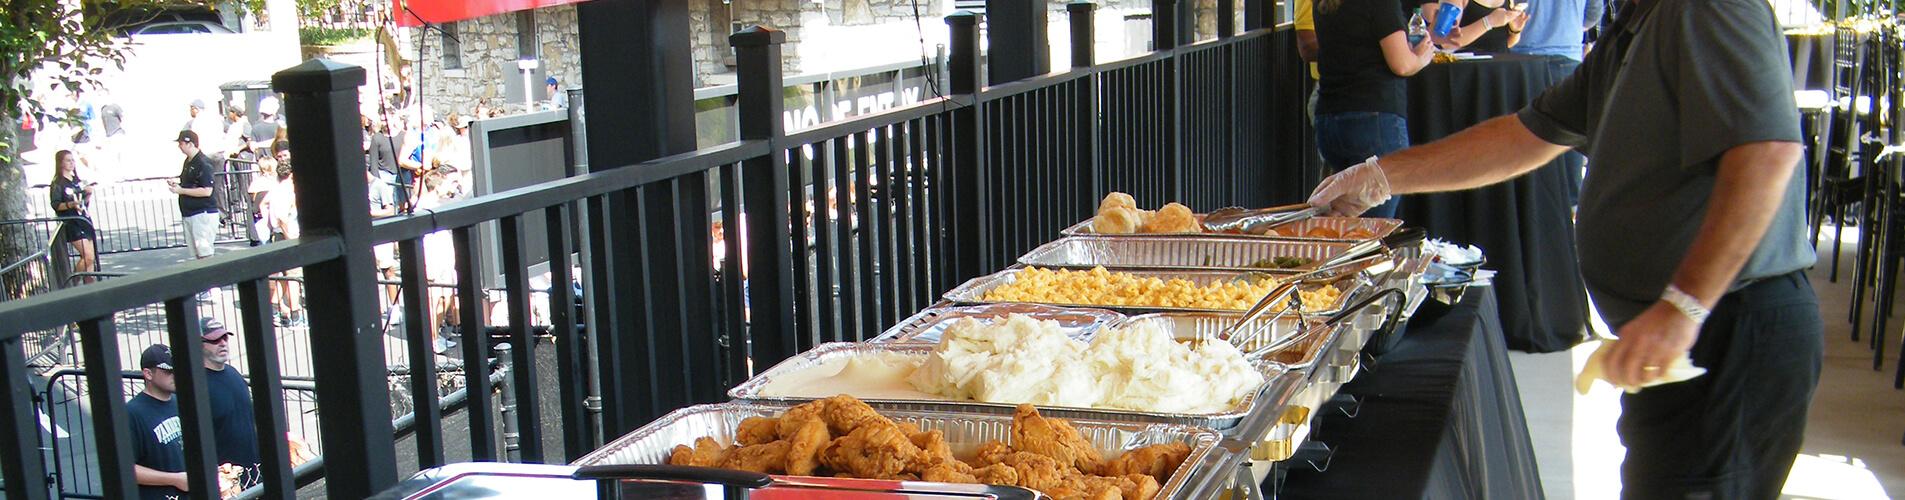 KFC Catered event buffet set up